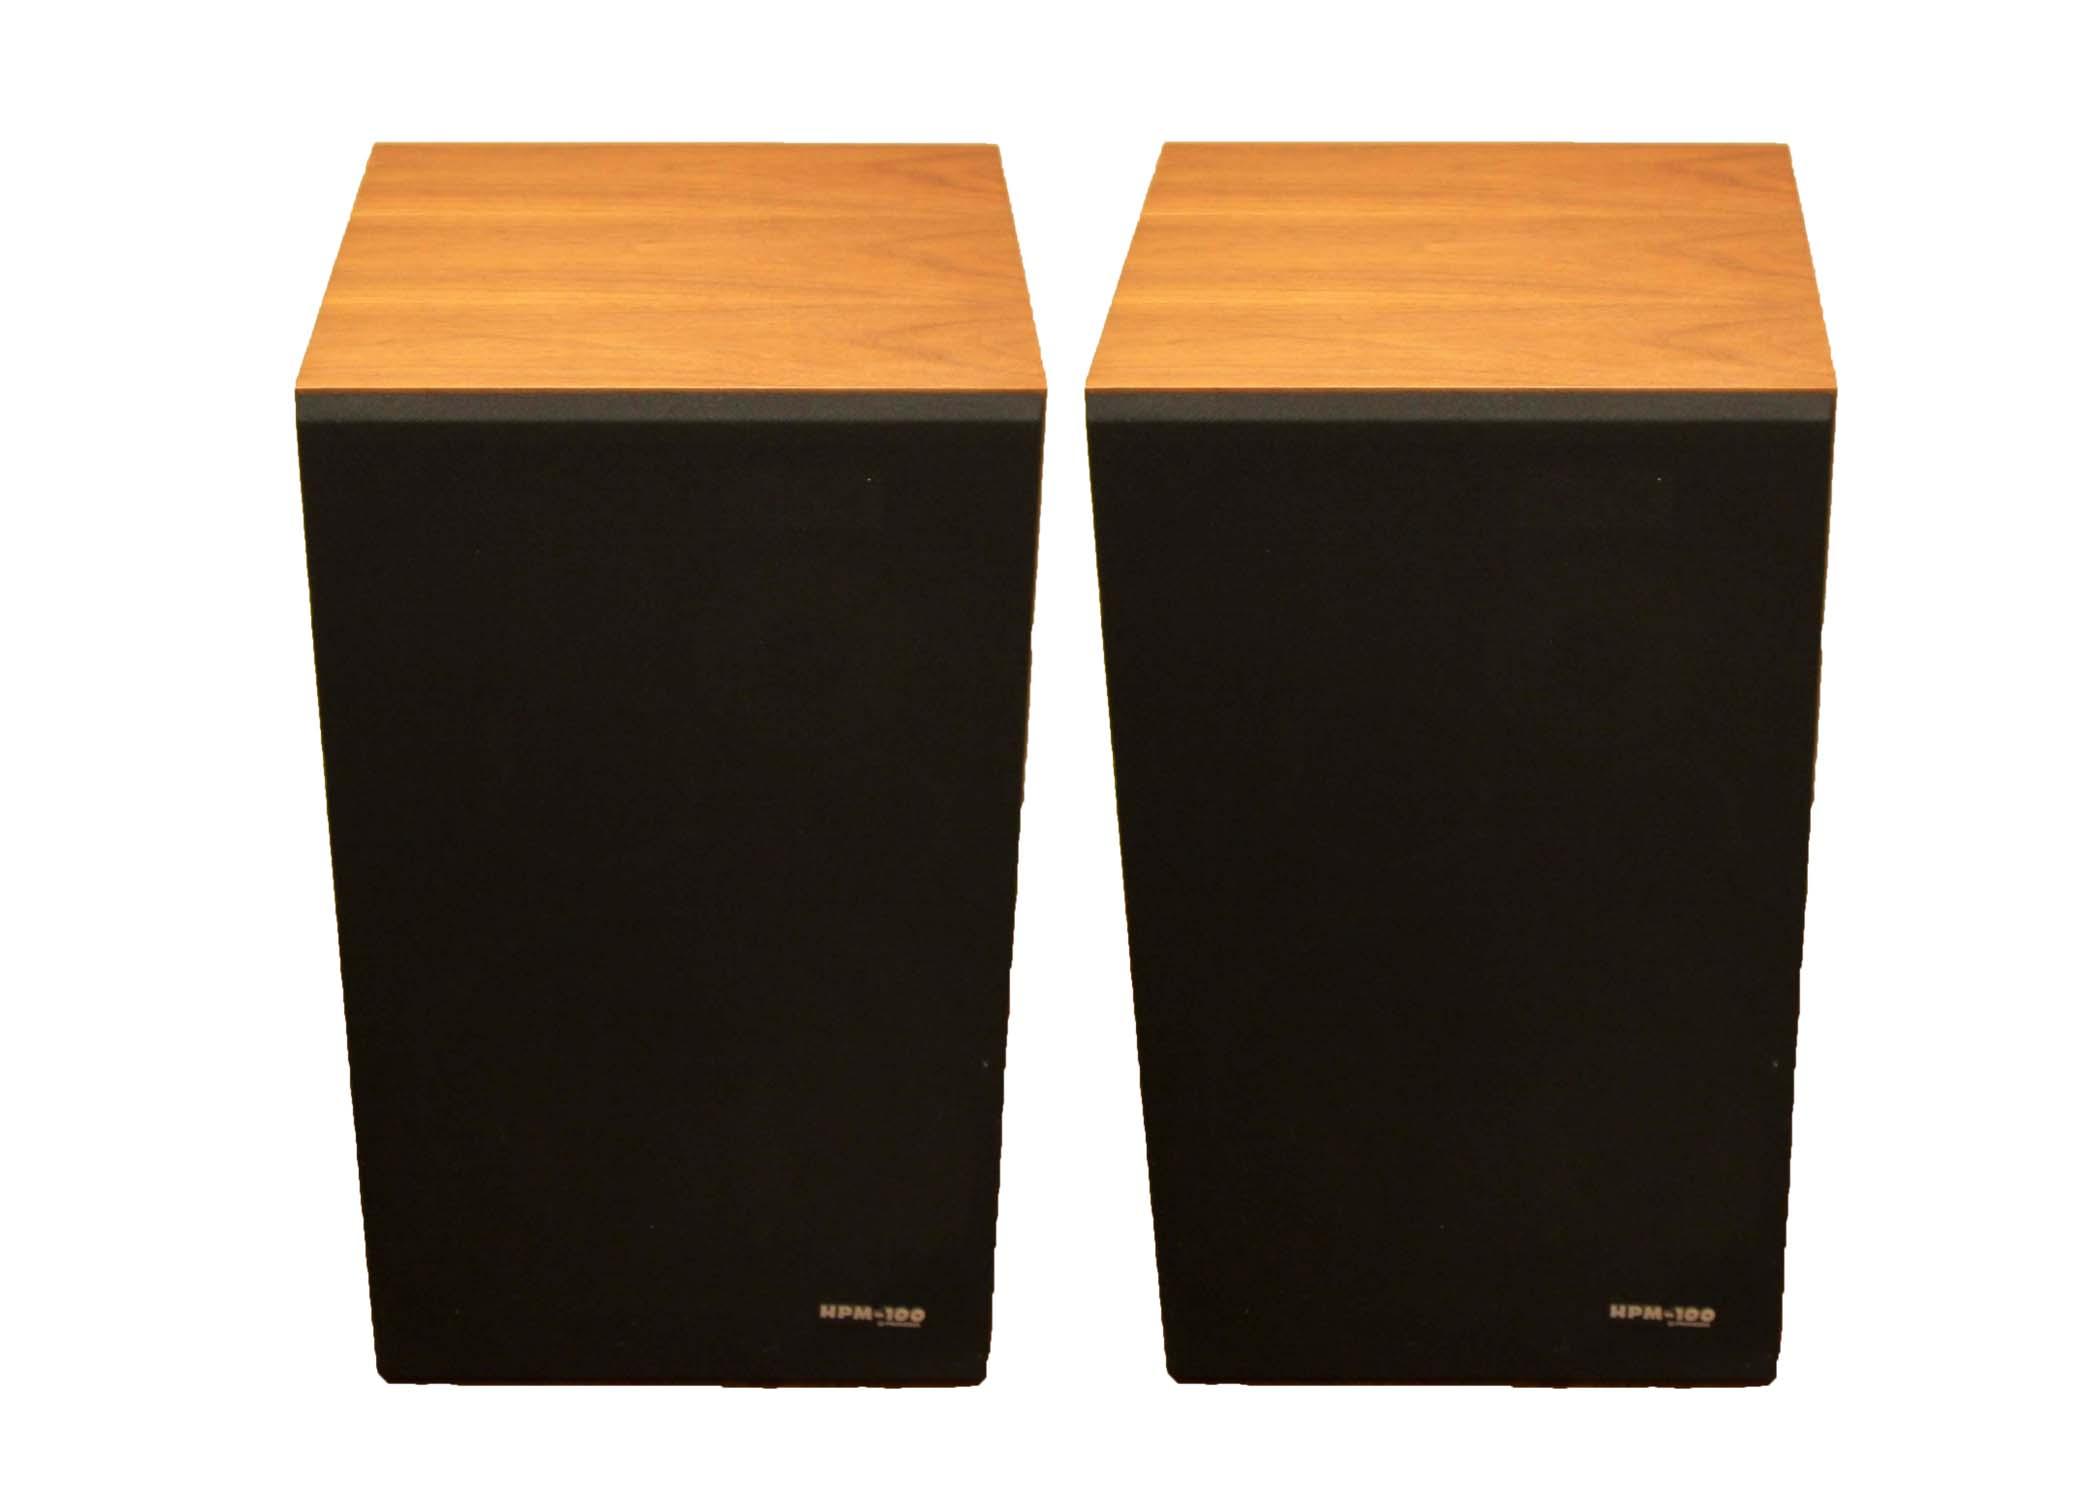 vintage pioneer speakers. vintage pioneer speakers a